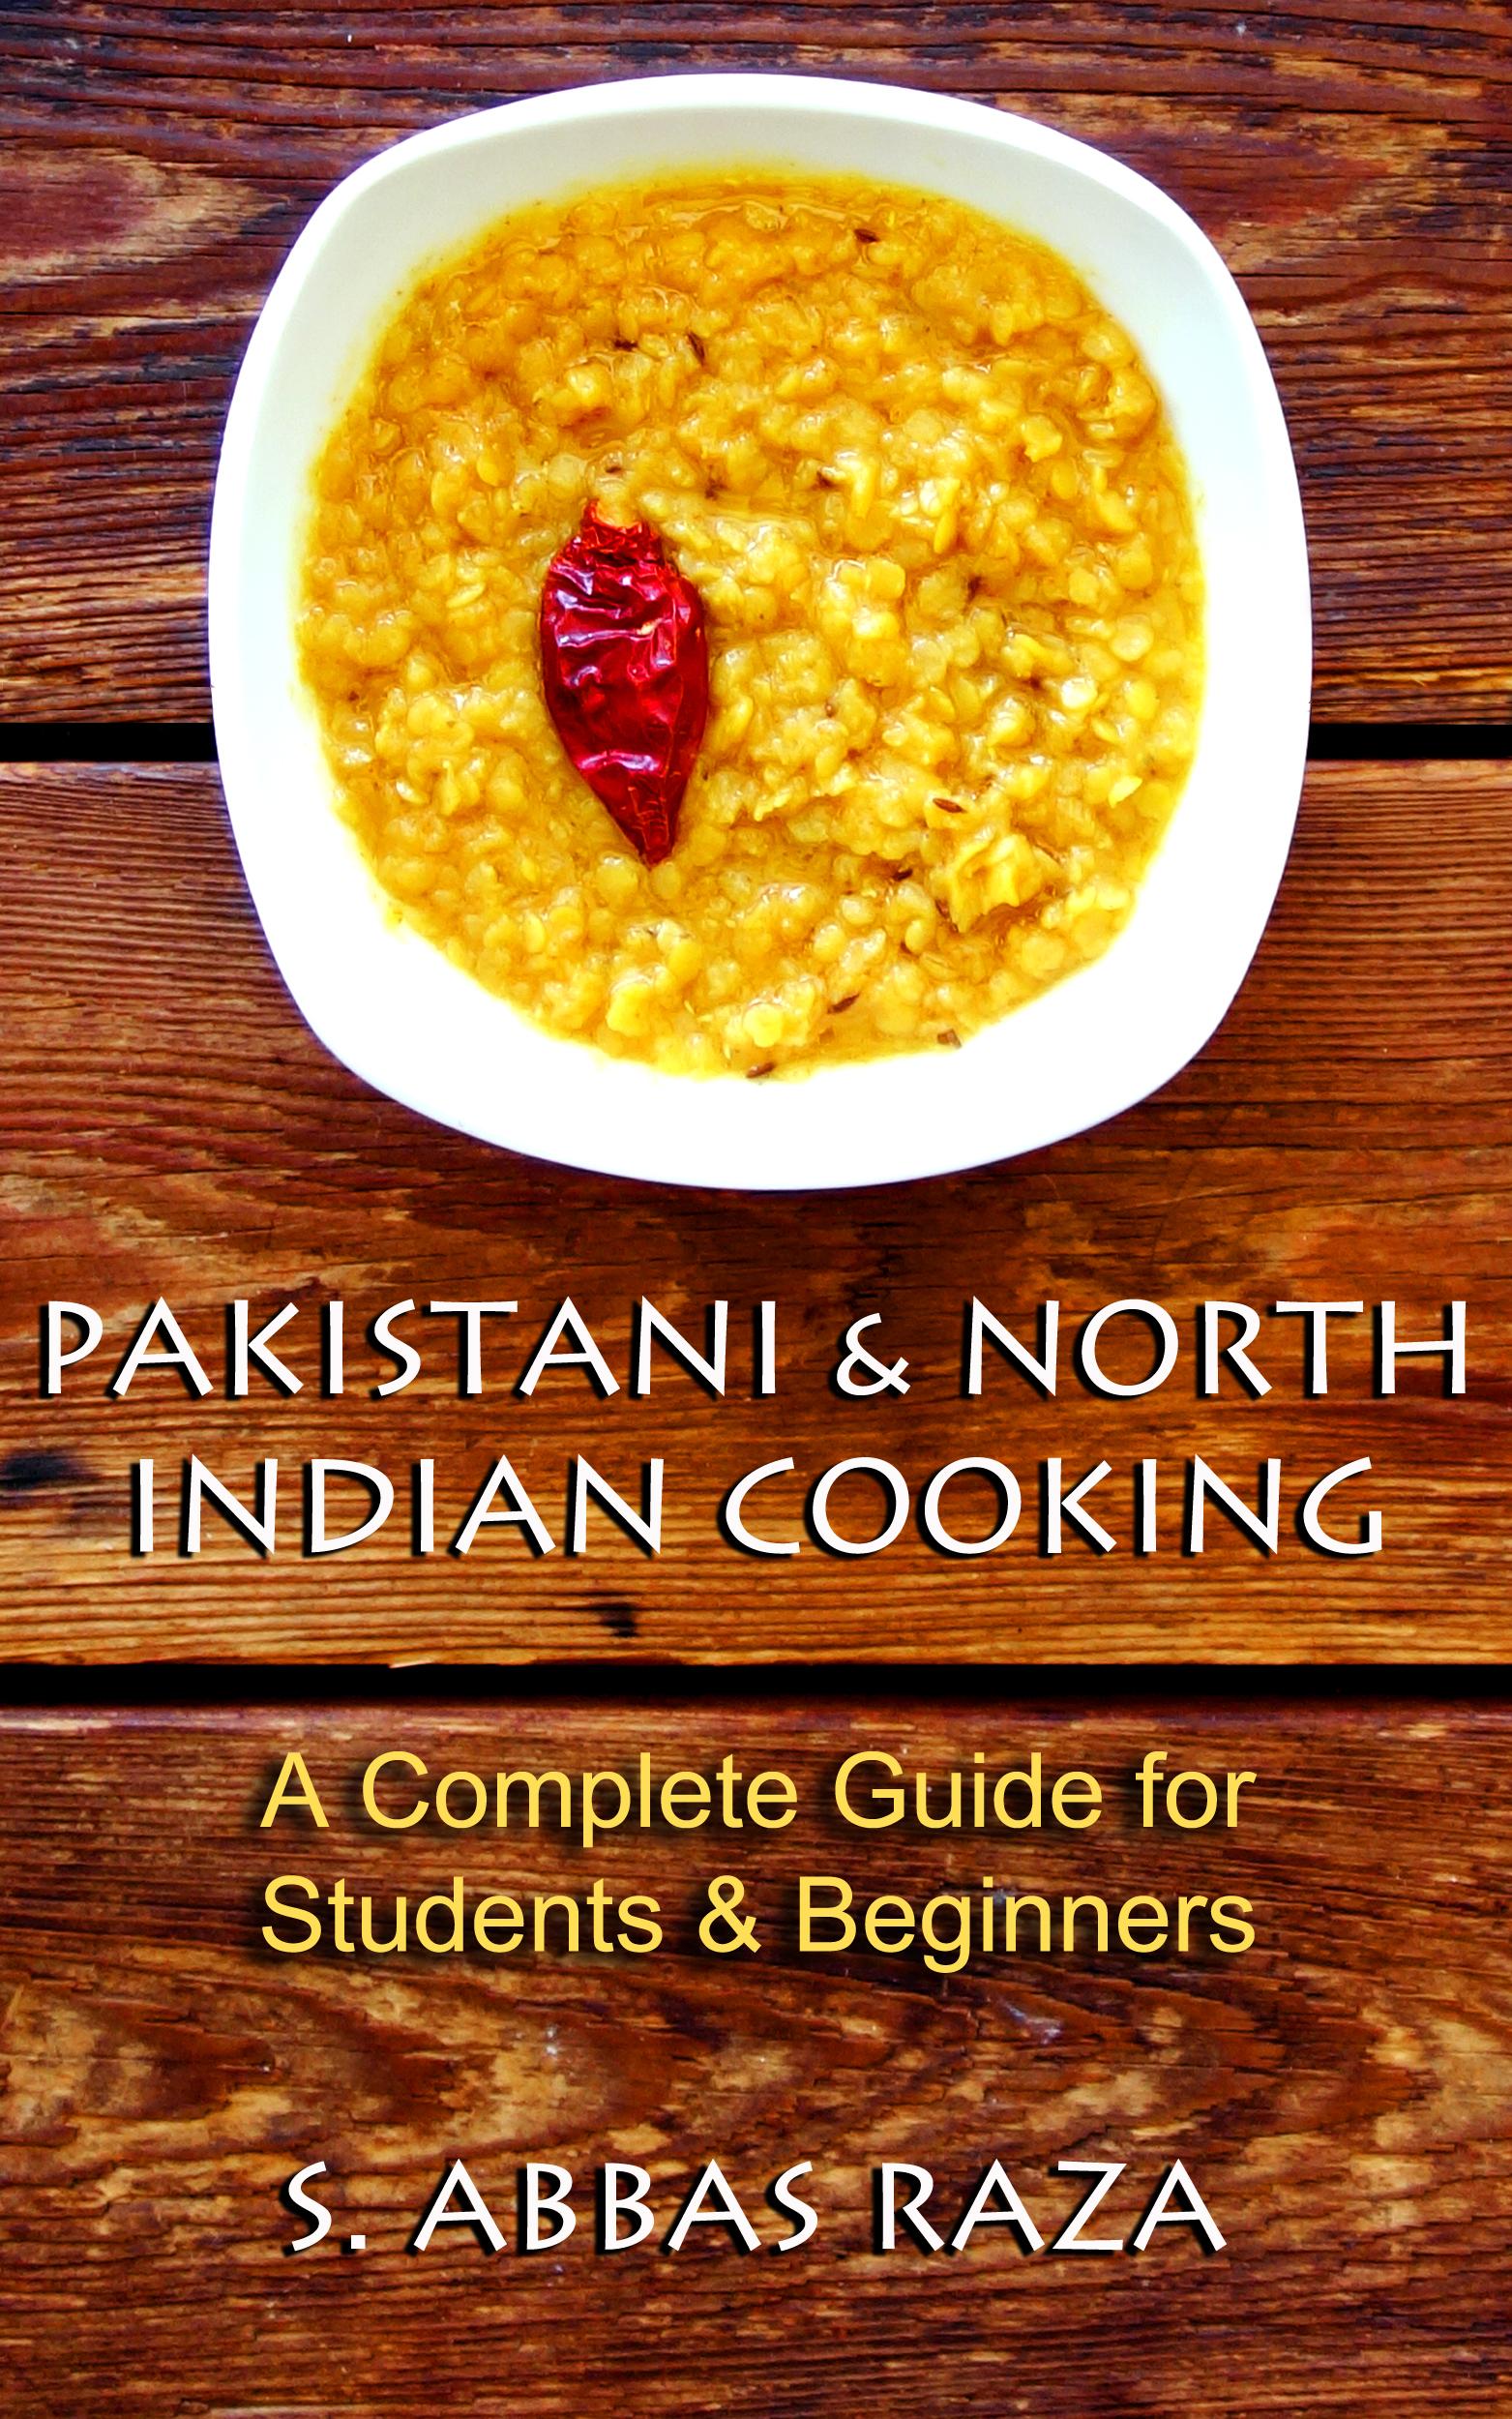 Pakistan-India-Cookbook-Cover.jpg